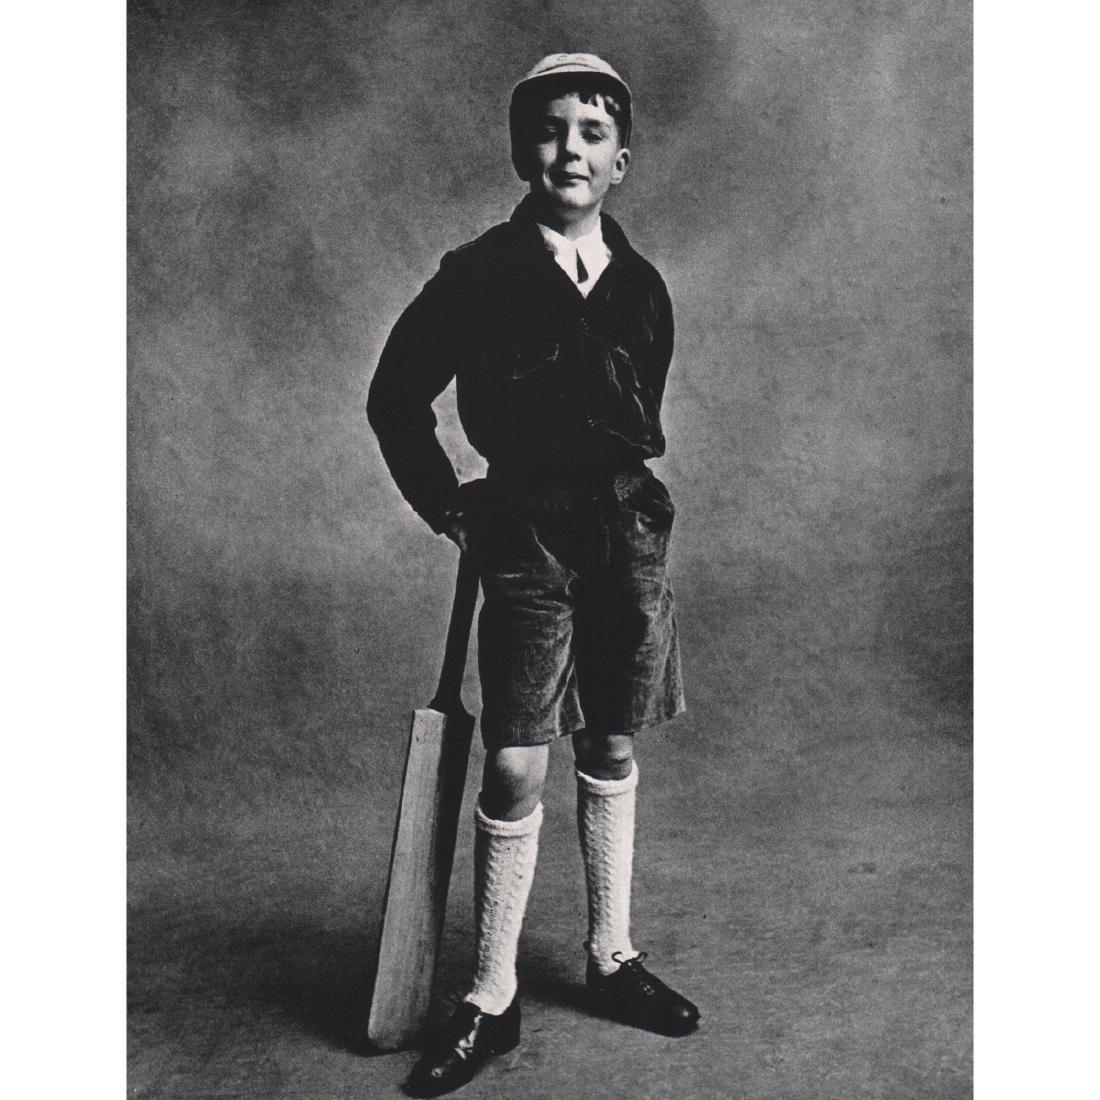 IRVING PENN - Cricket Player